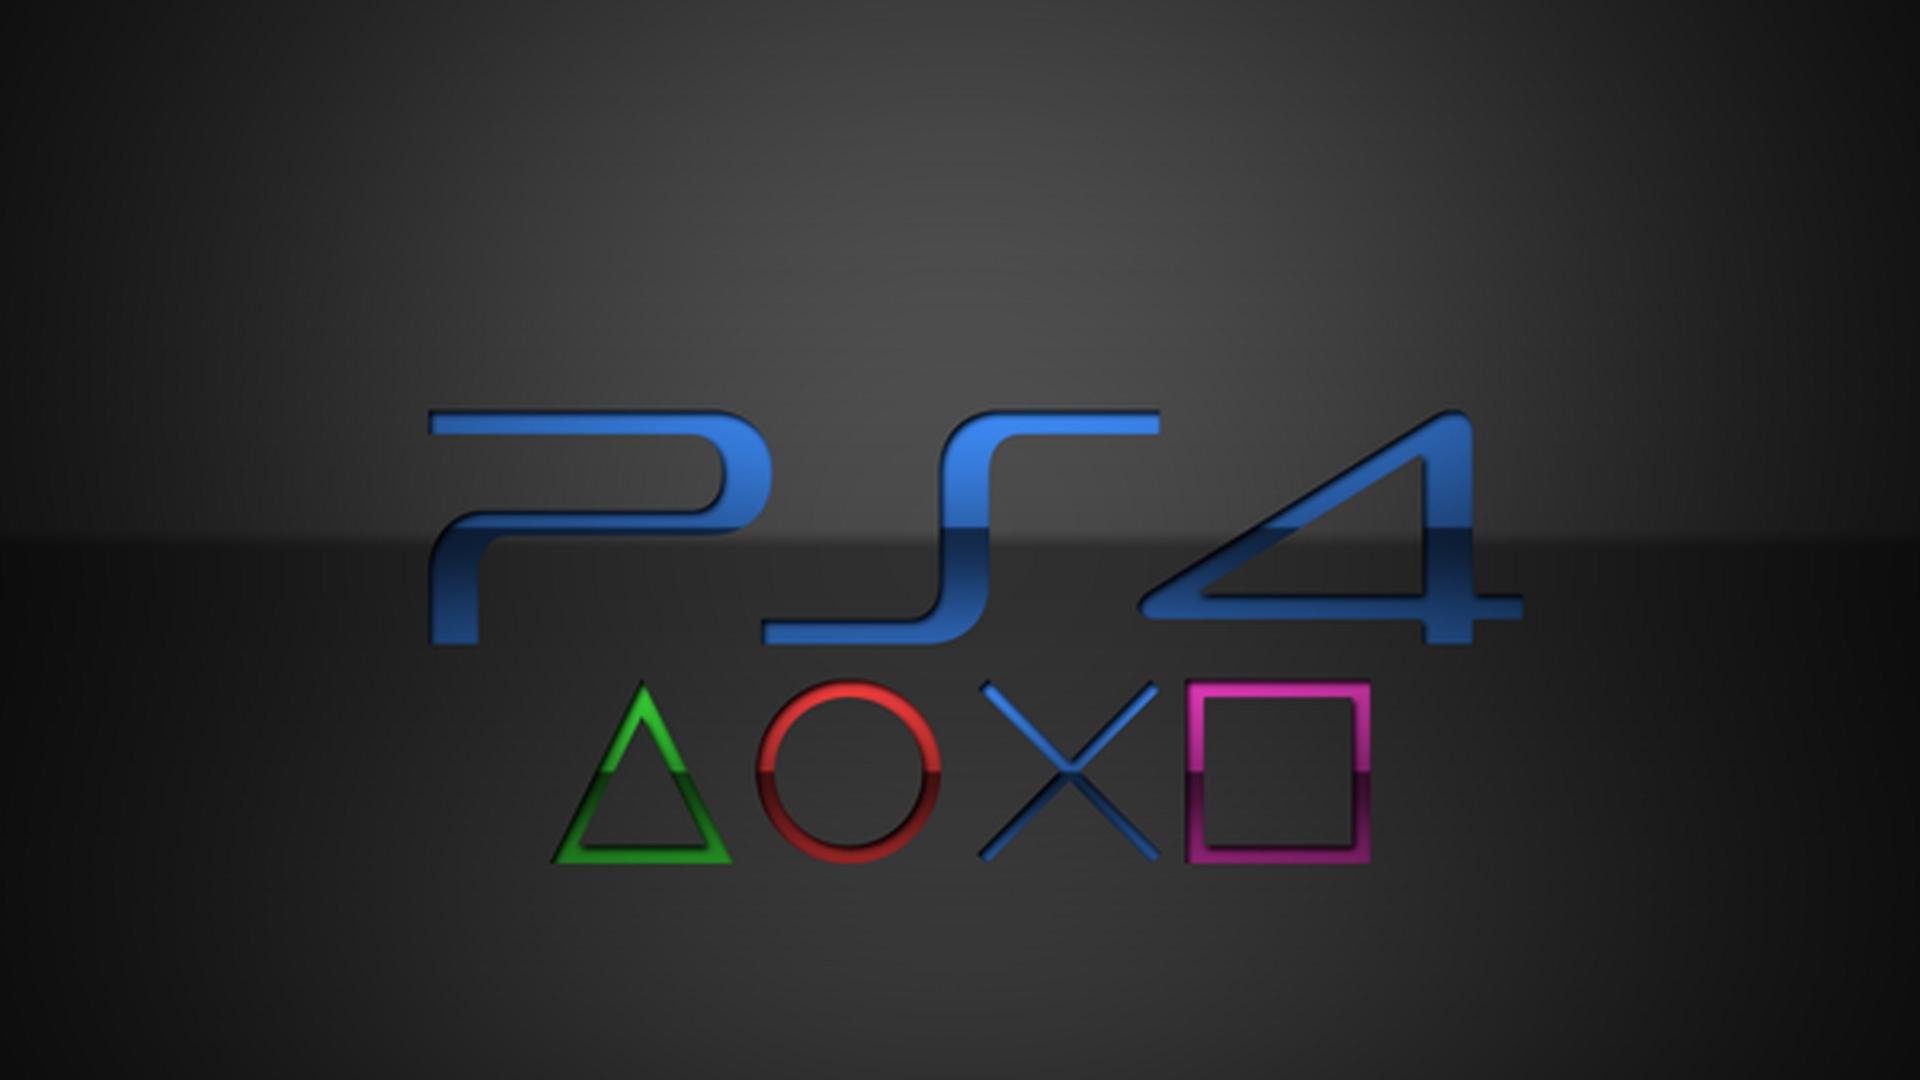 Playstation logo wallpaper wallpapersafari - Ps4 wallpaper hd ...